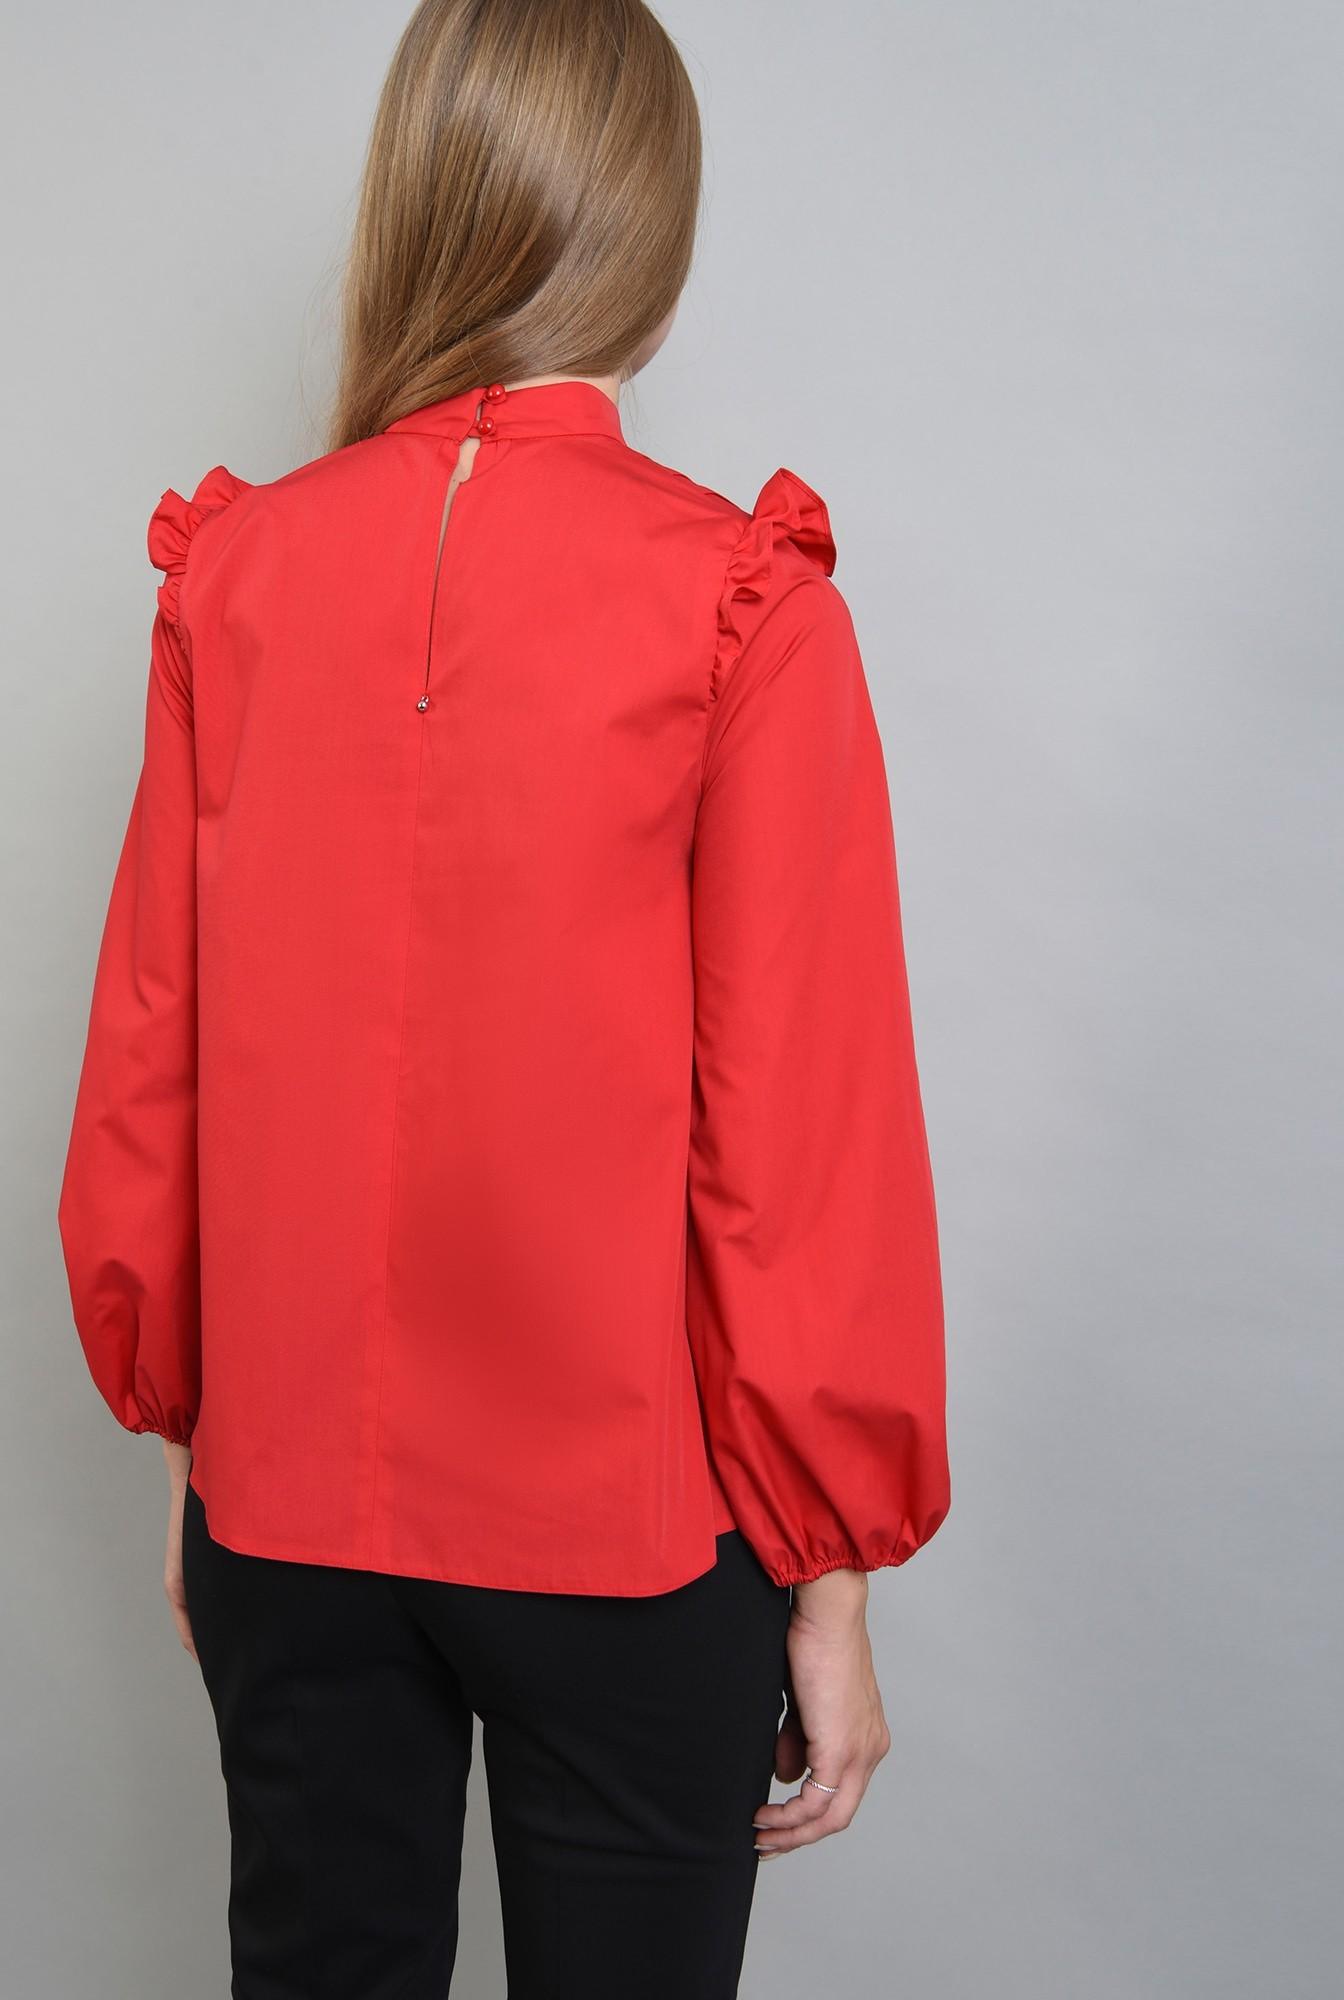 1 - 360 - bluza rosie din bumbac, cu pliuri si volan, Poema